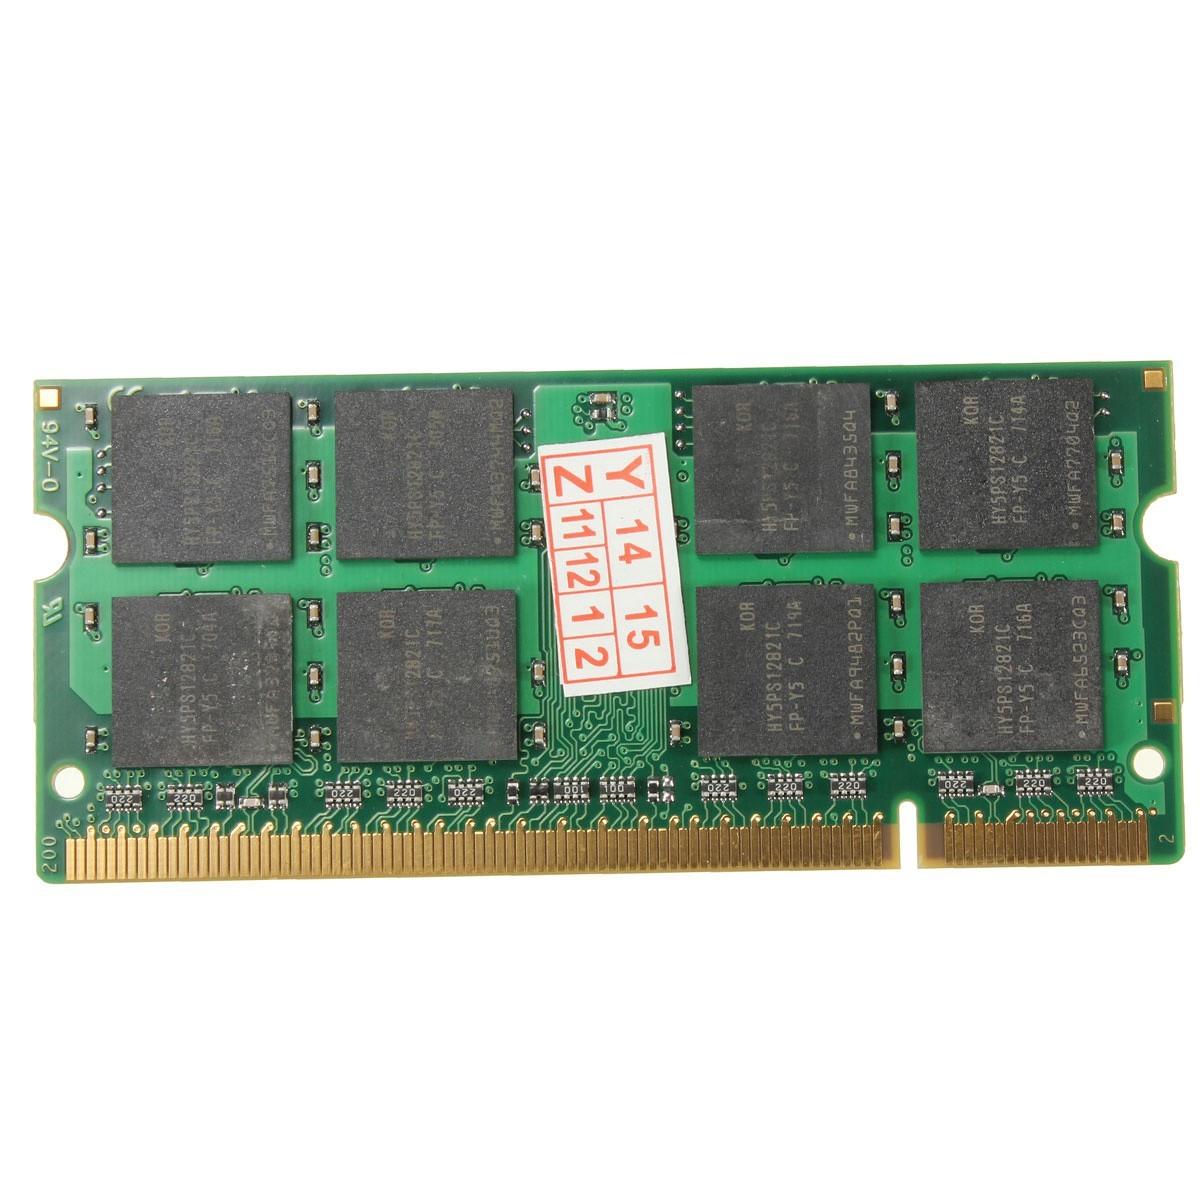 Philippines 1gb Ddr2 Pc2 6400 800mhz Non Ecc Notebook Laptop Pc Ram Sodimm 2gb Pc6400 Dimm Memory Ram200 Pins